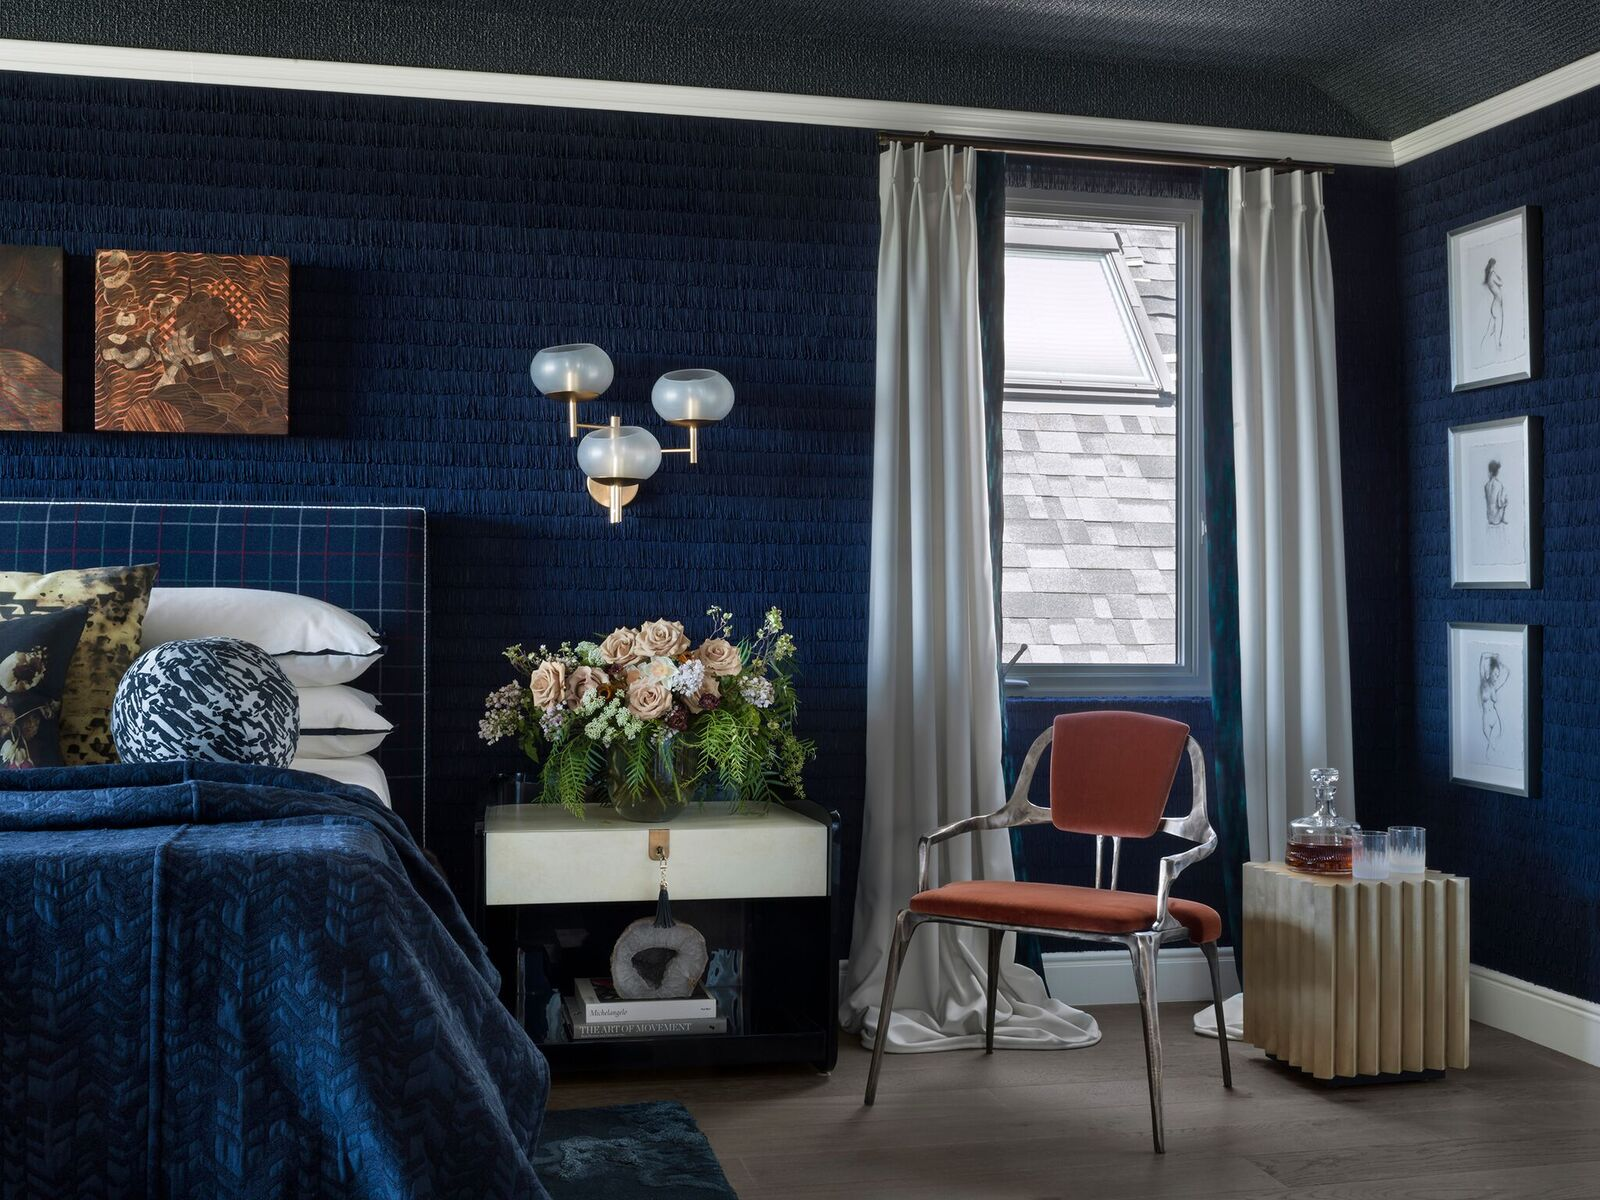 Upstairs, elders sleep in an elegant master bedroom designed by Jeff Schlarb. He calls it Ten Thousand Dreams, explaining,